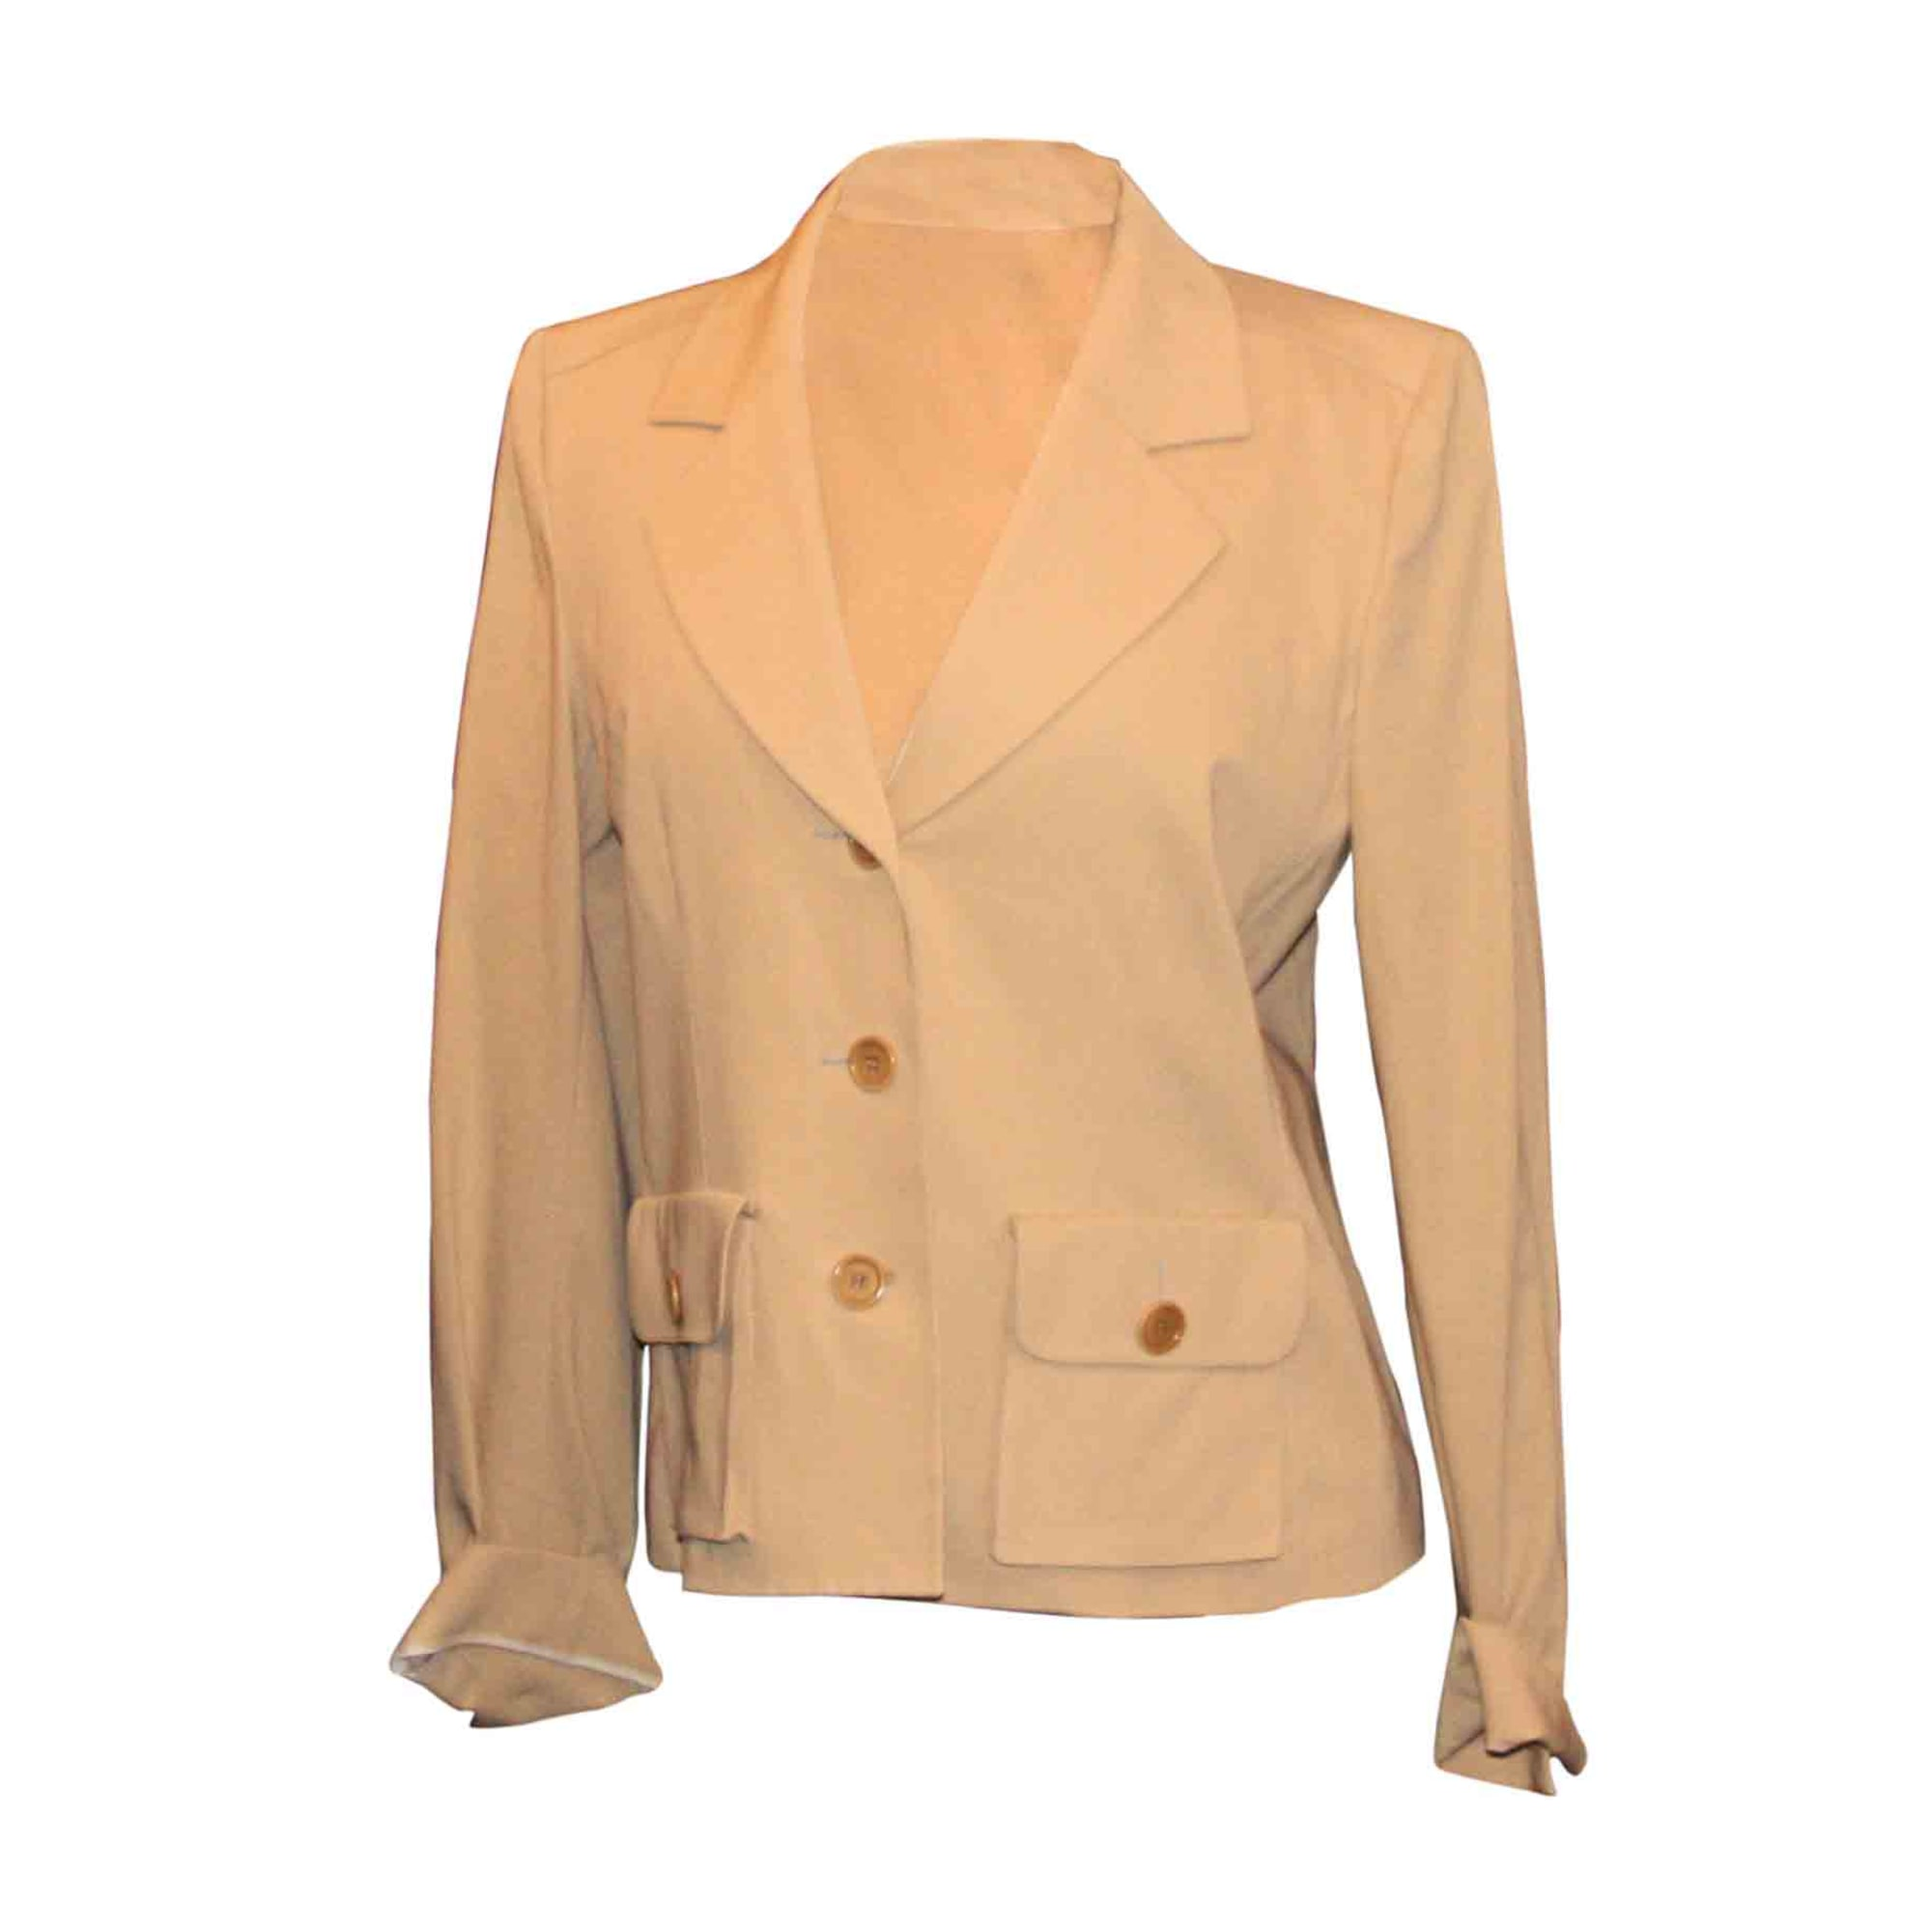 Blazer, veste tailleur SONIA RYKIEL Beige, camel